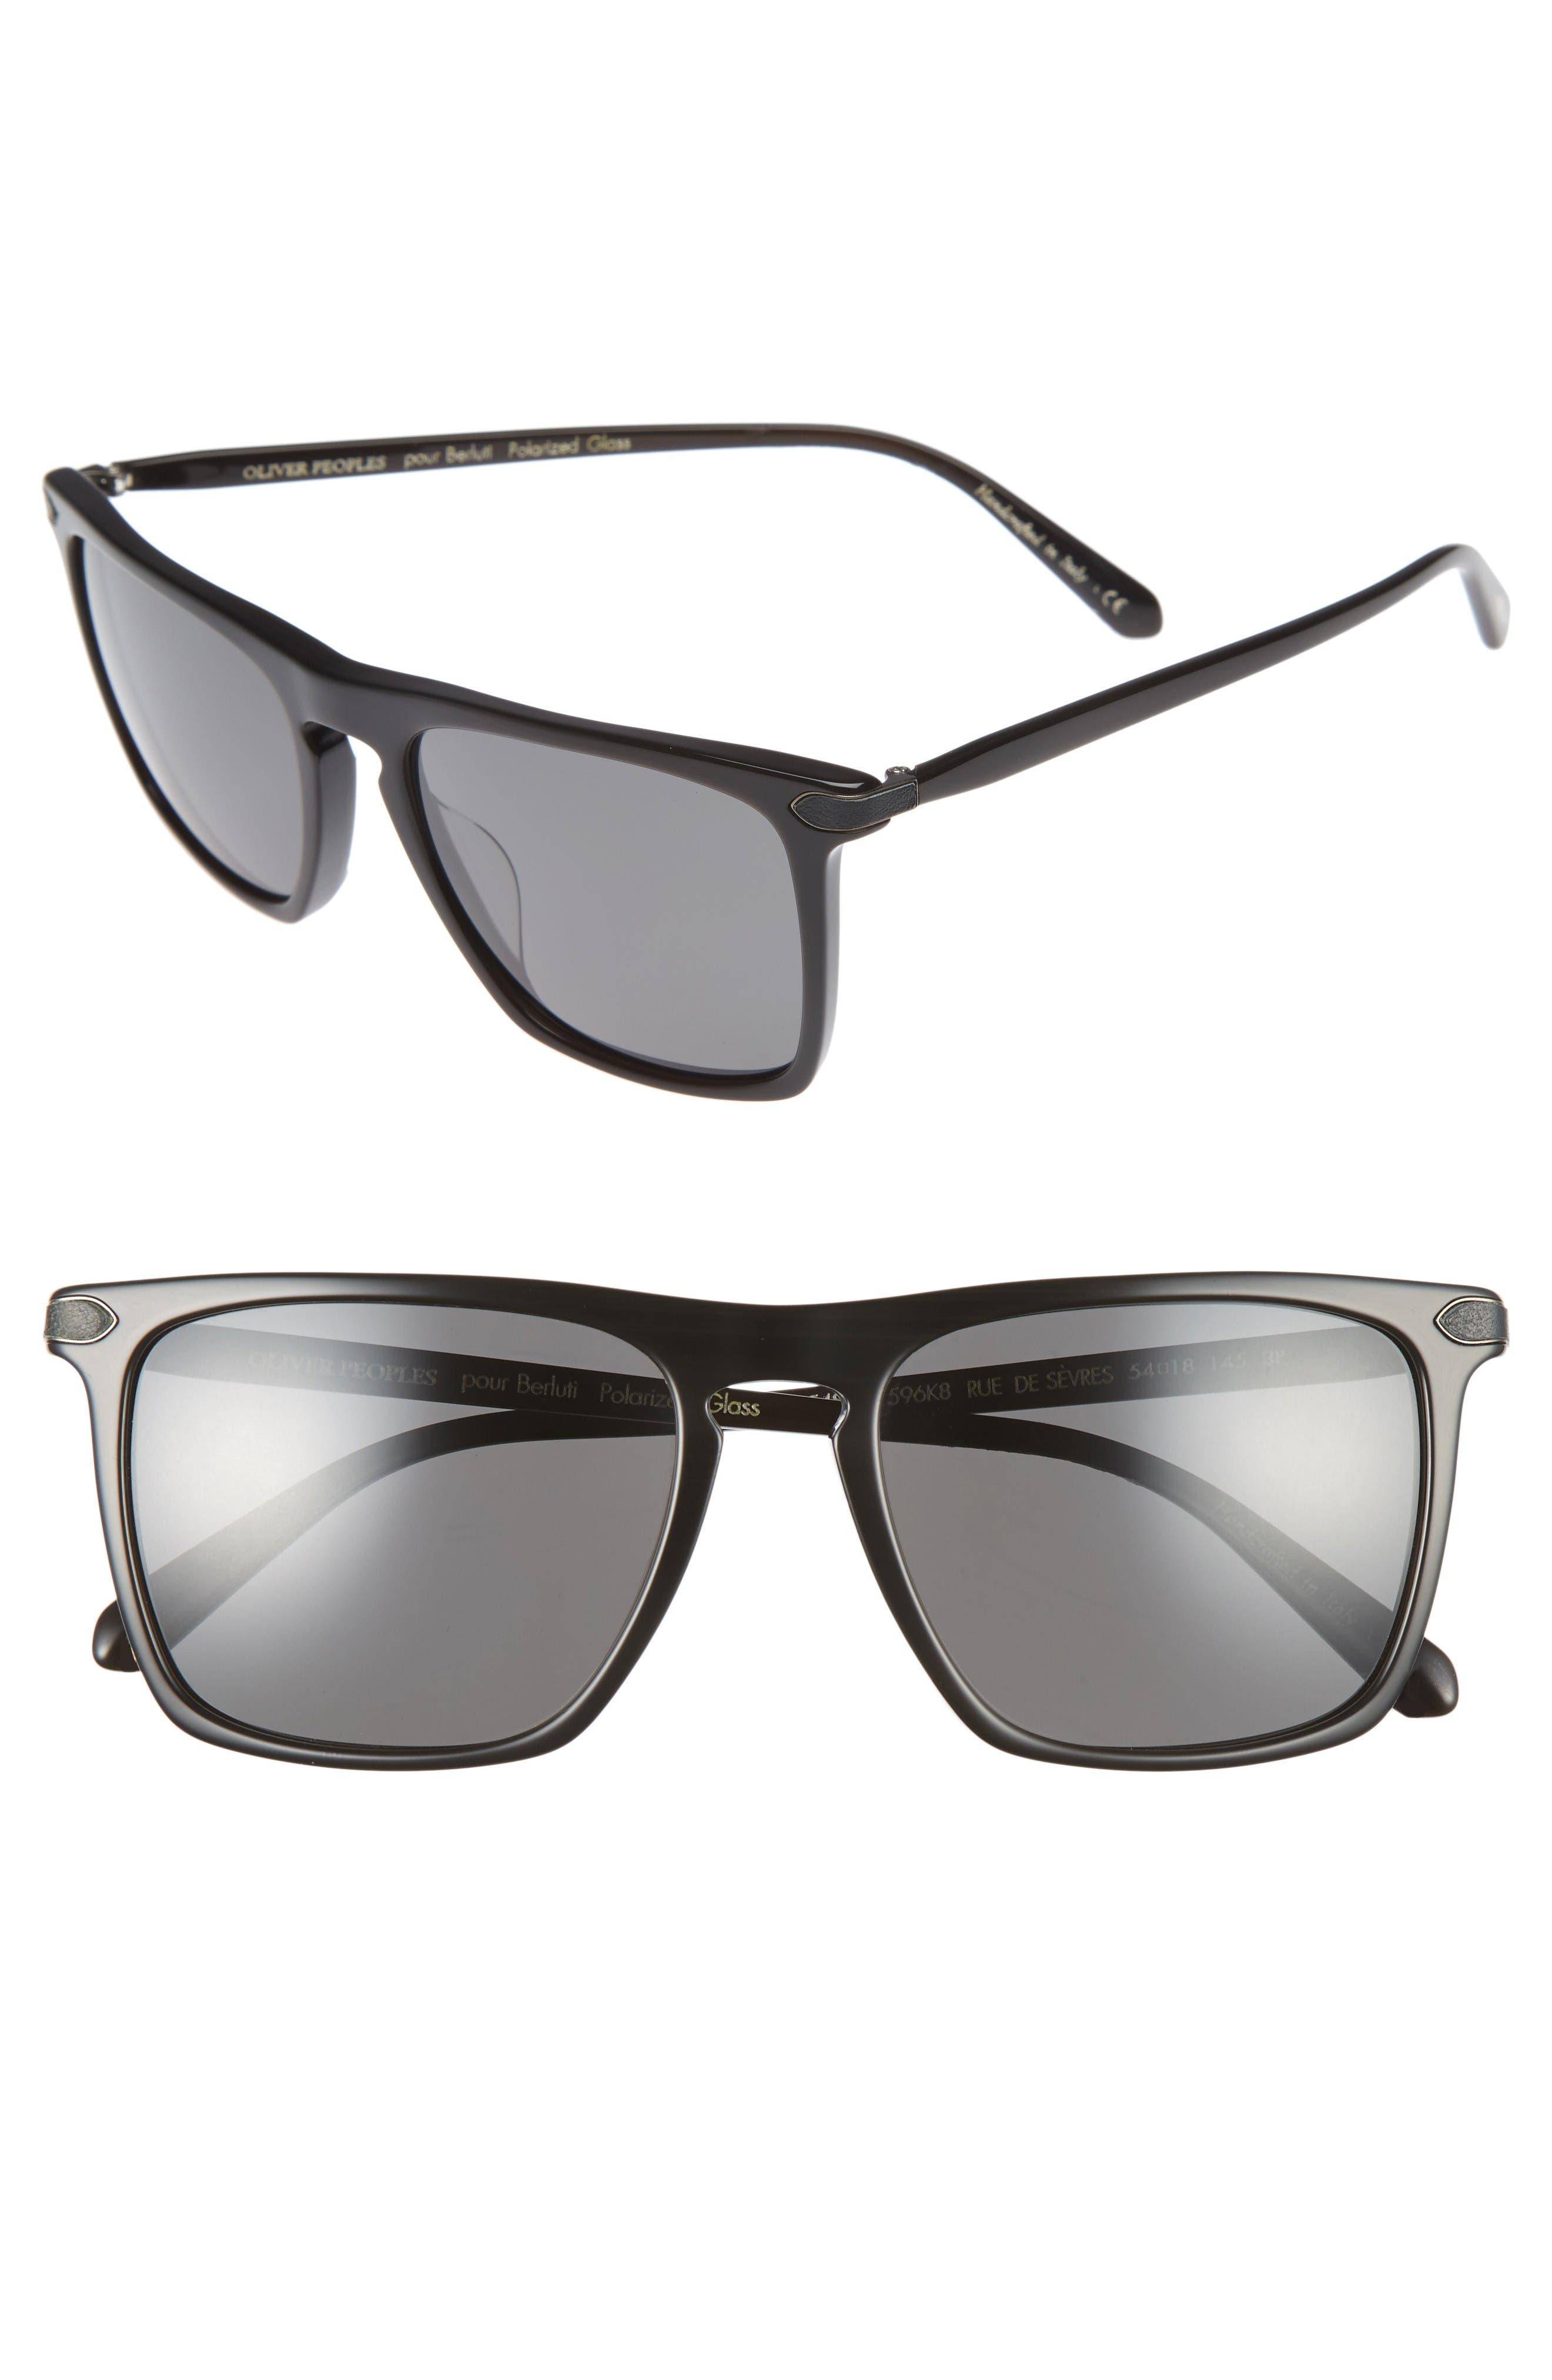 Rue De Sevres 54mm Polarized Sunglasses,                             Main thumbnail 1, color,                             Black